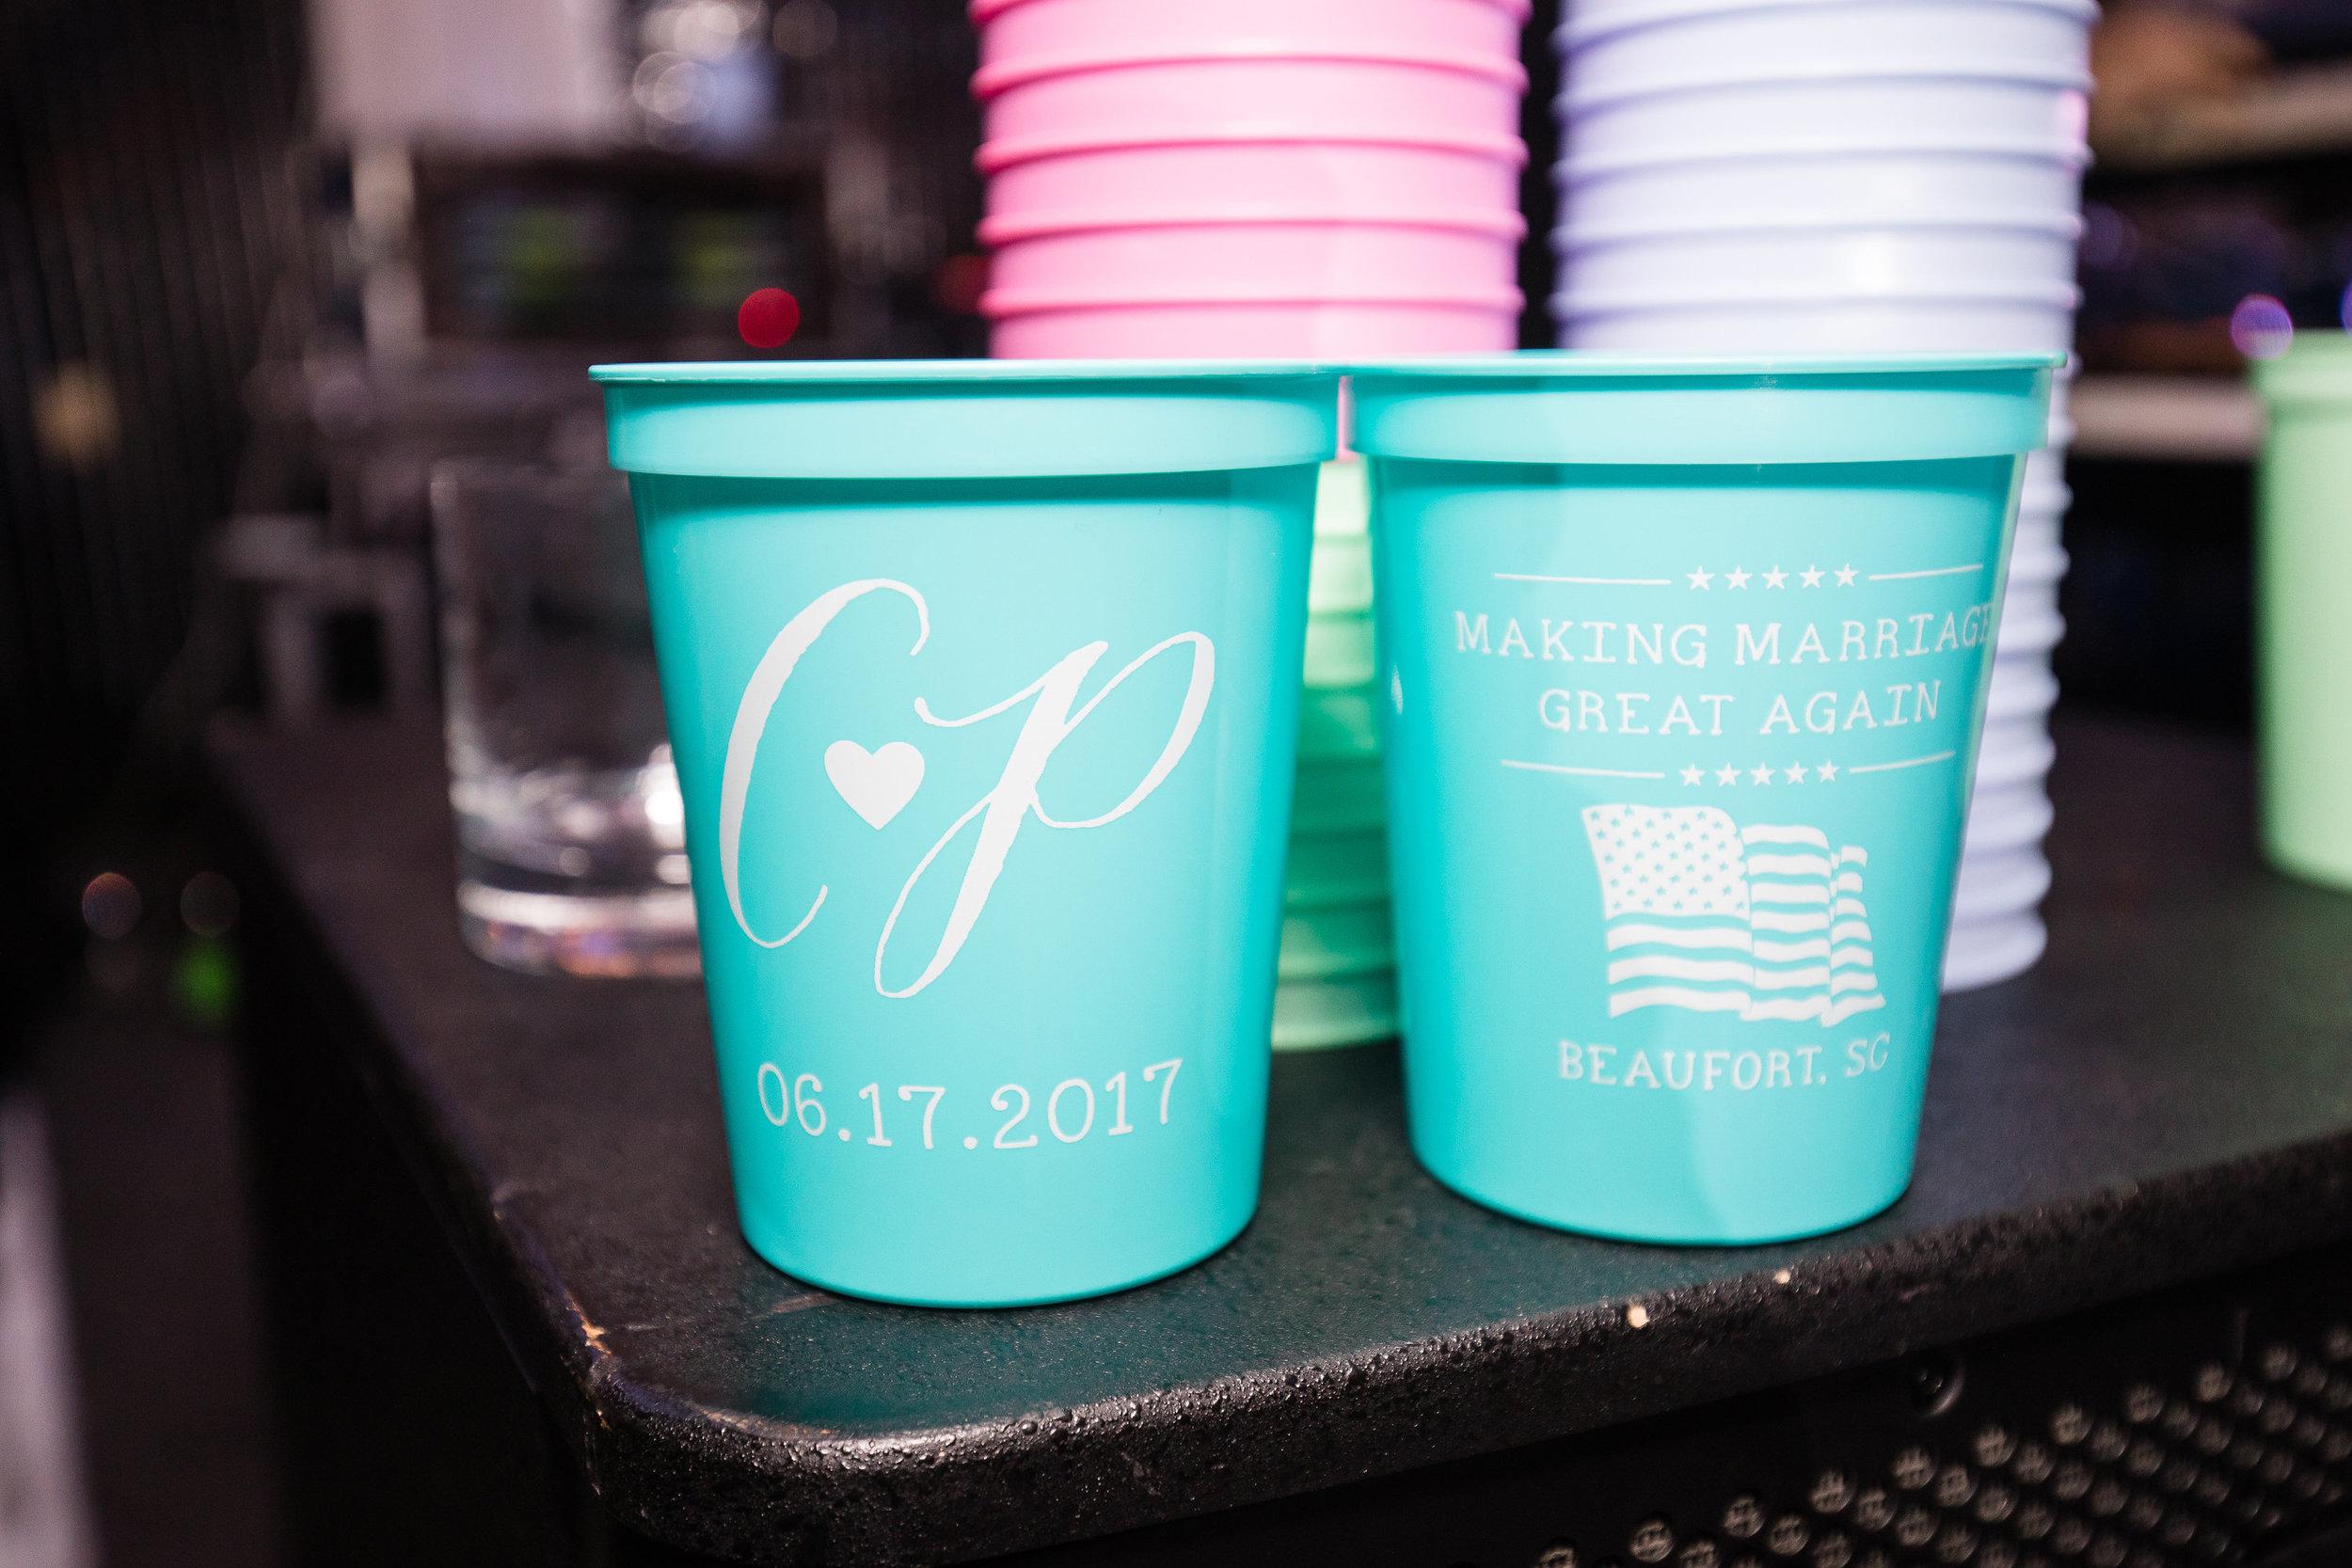 Custom Making Marriage Great Again wedding cups